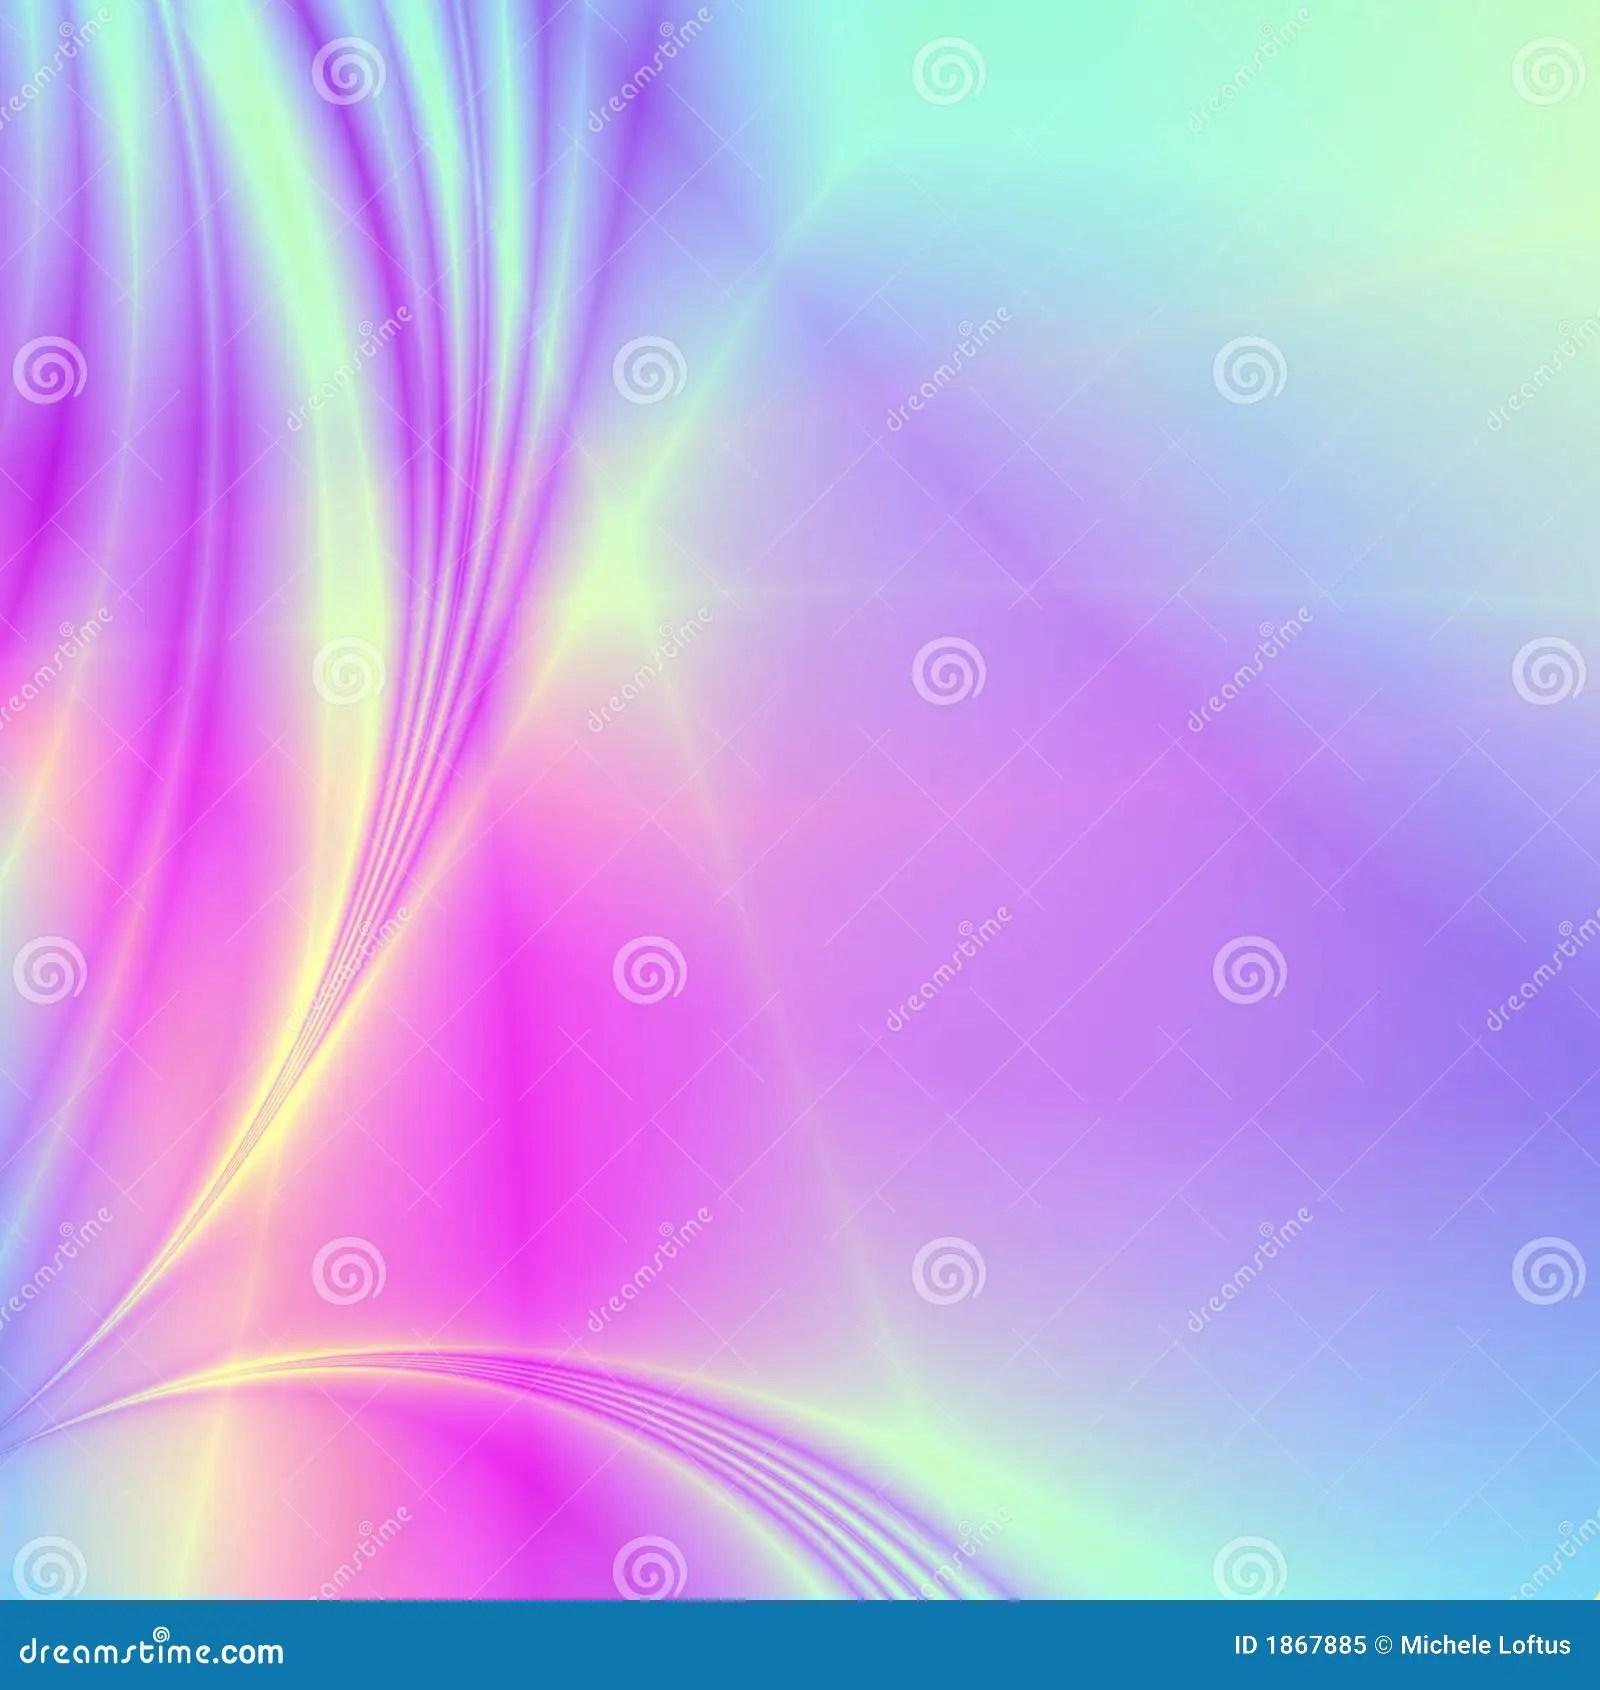 tie dye powerpoint background